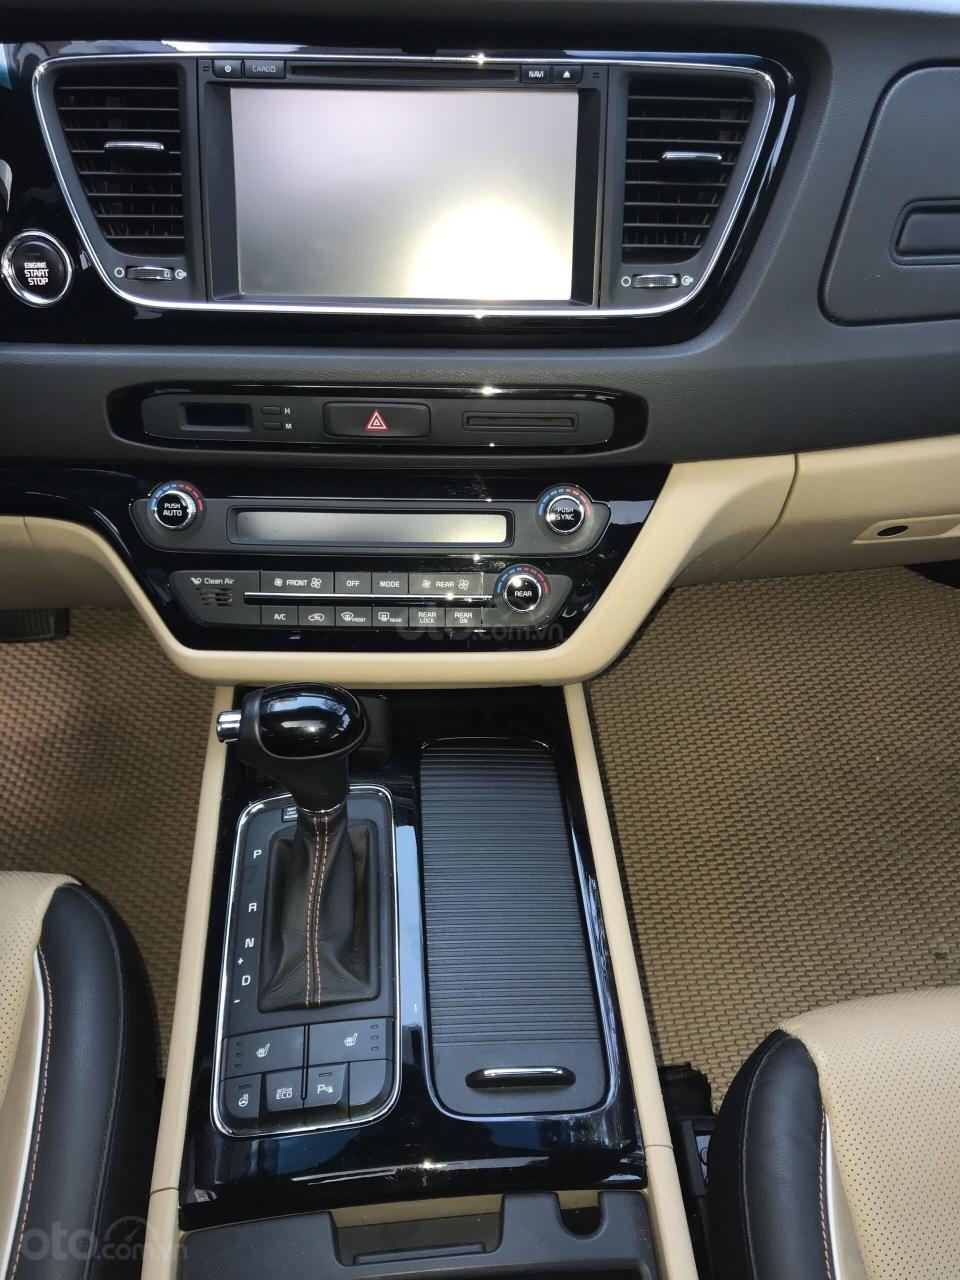 Kia Grand Sedona CRDI model 2018, máy dầu bản cao cấp nhất, full kịch option (18)